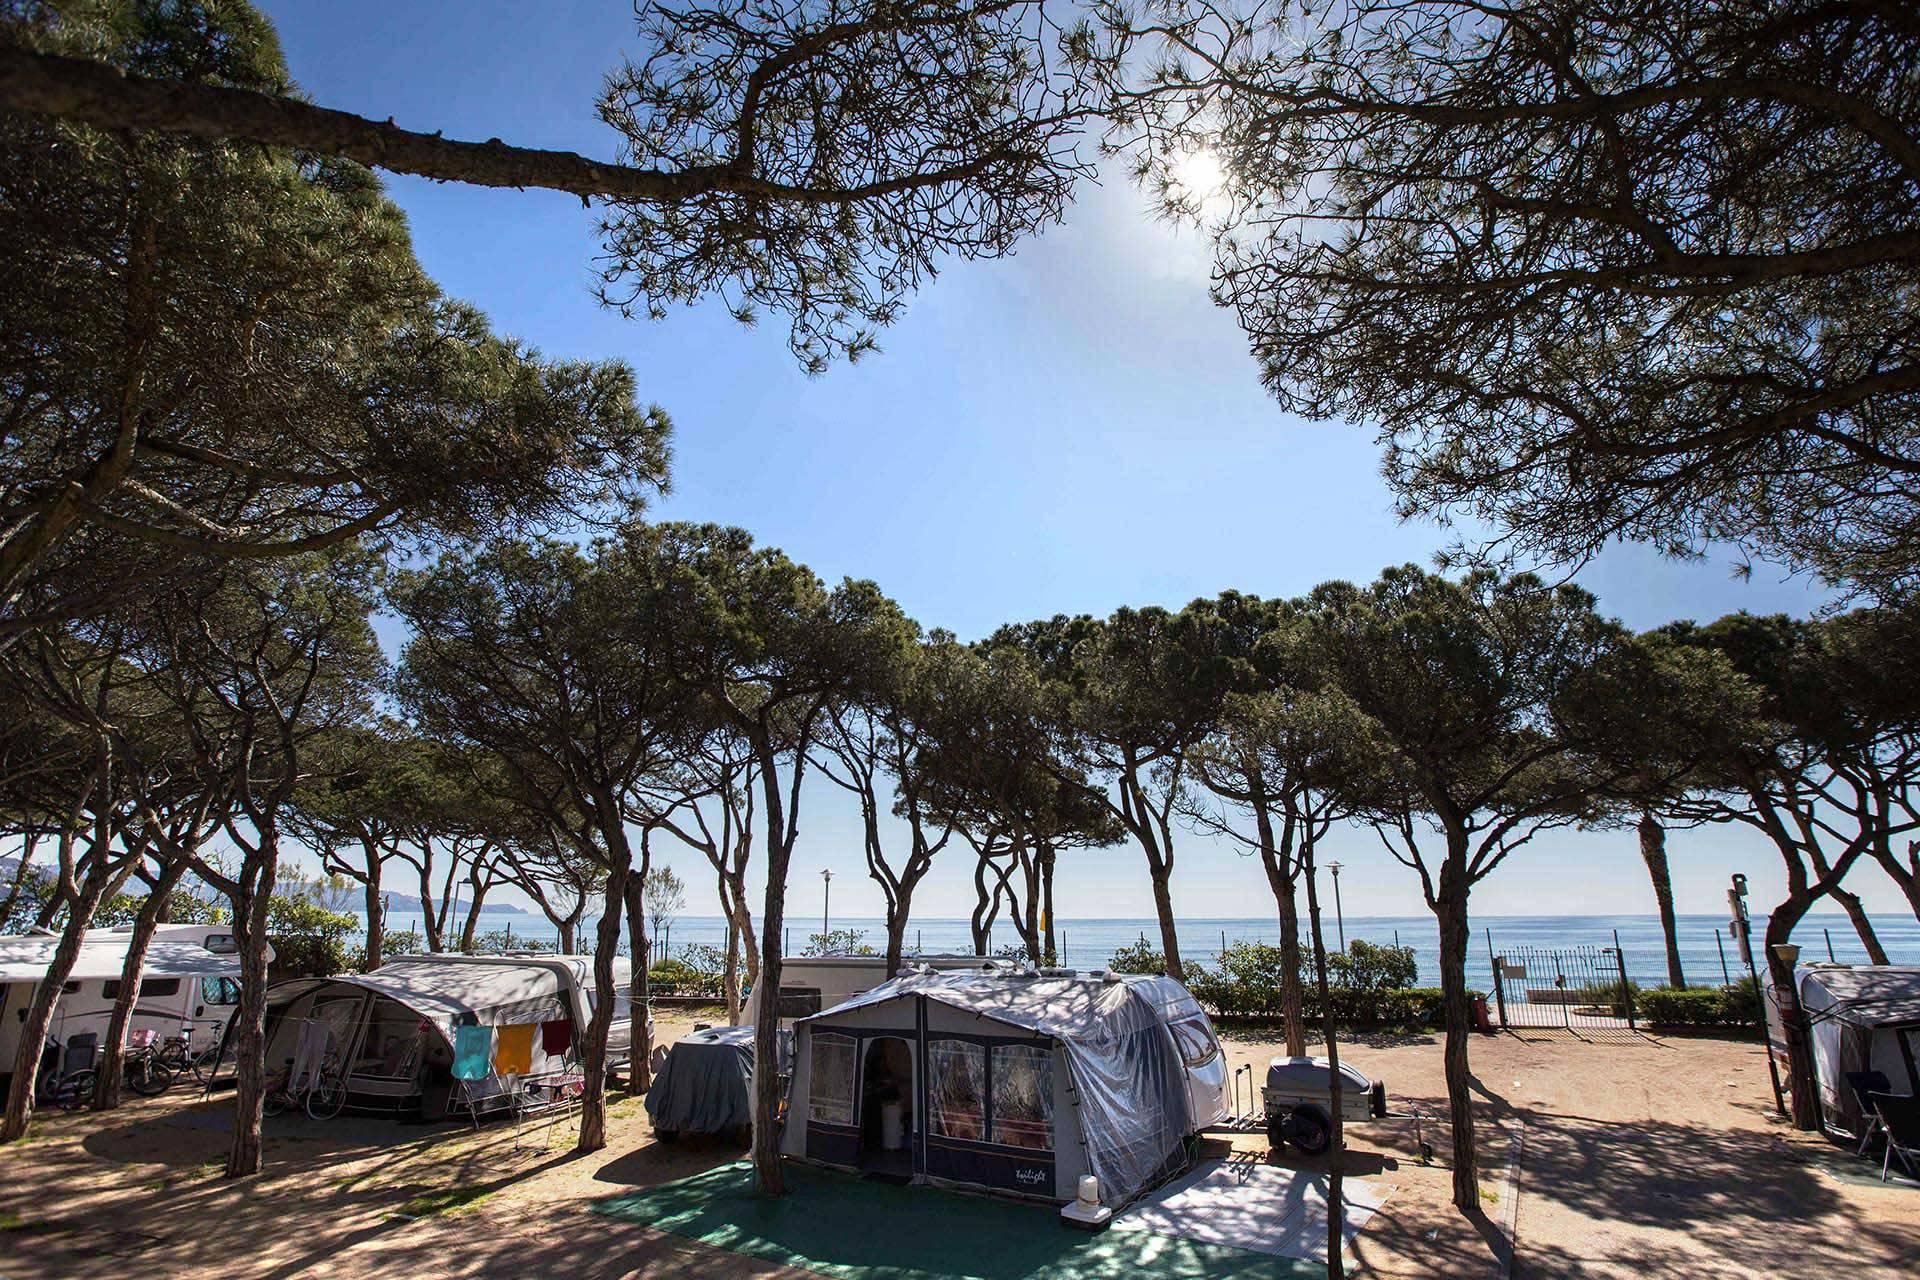 Camping - Blanes - Blanes - Costa Brava - Espagne